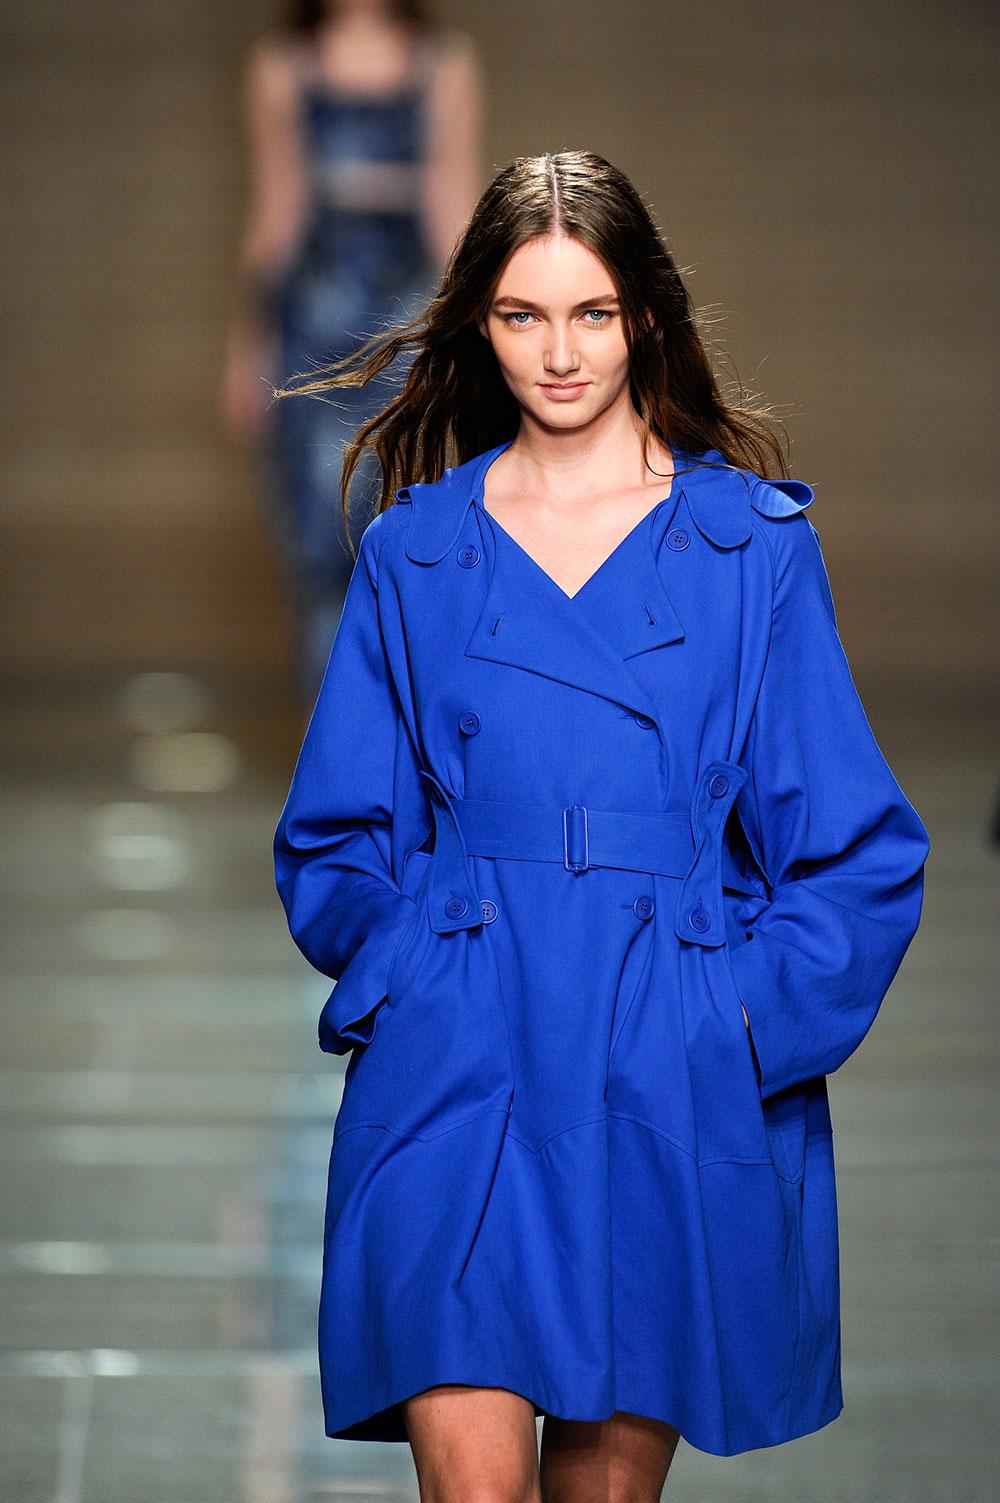 पुर्तगाल फैशन कलेक्शन को पेश करती एक मॉडल।